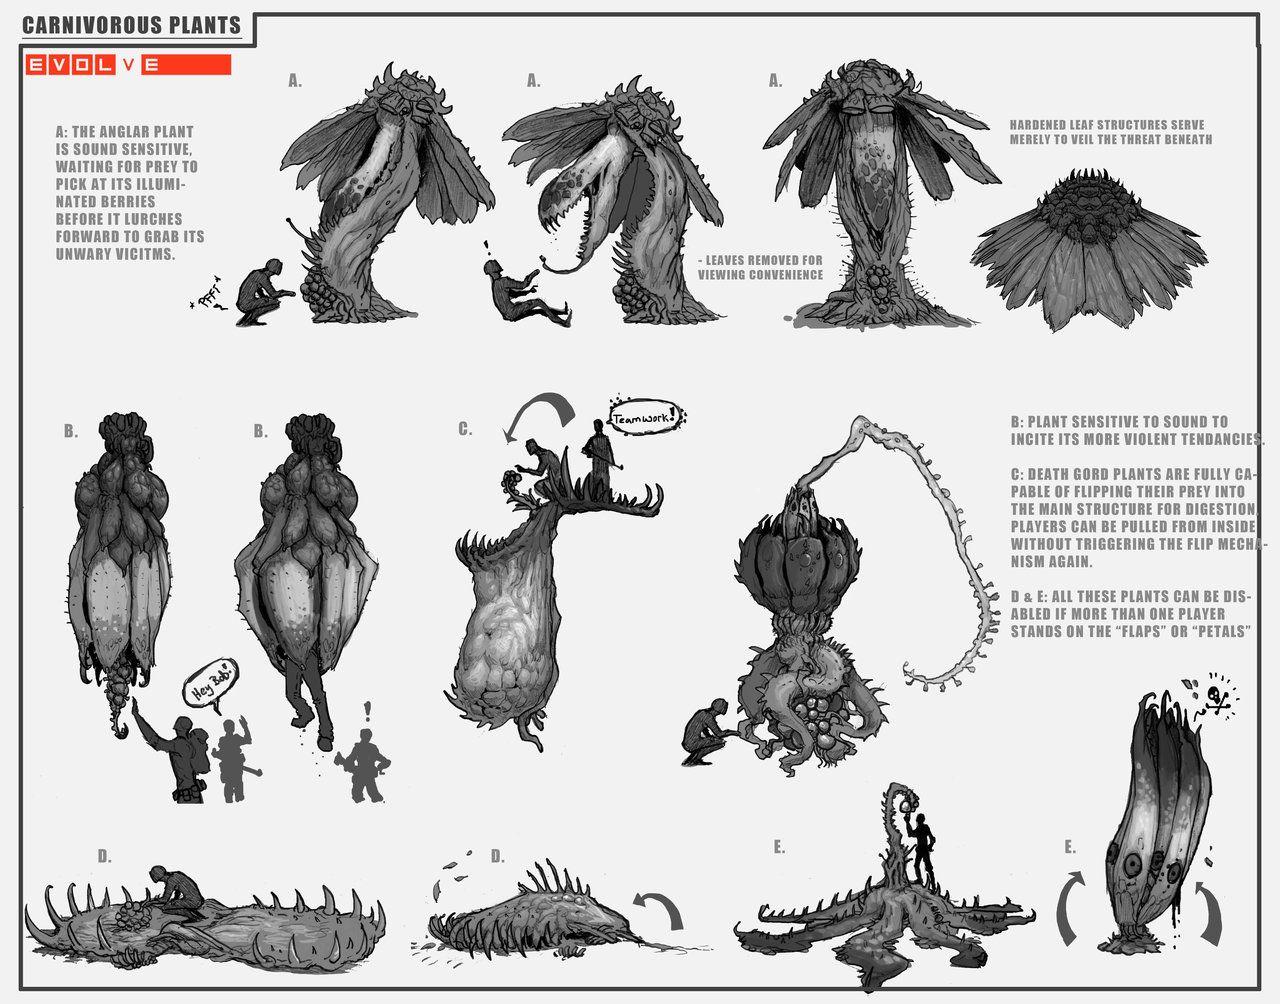 Carnivorous-Plants-pg1 by Stephen-0akley Evolve chart